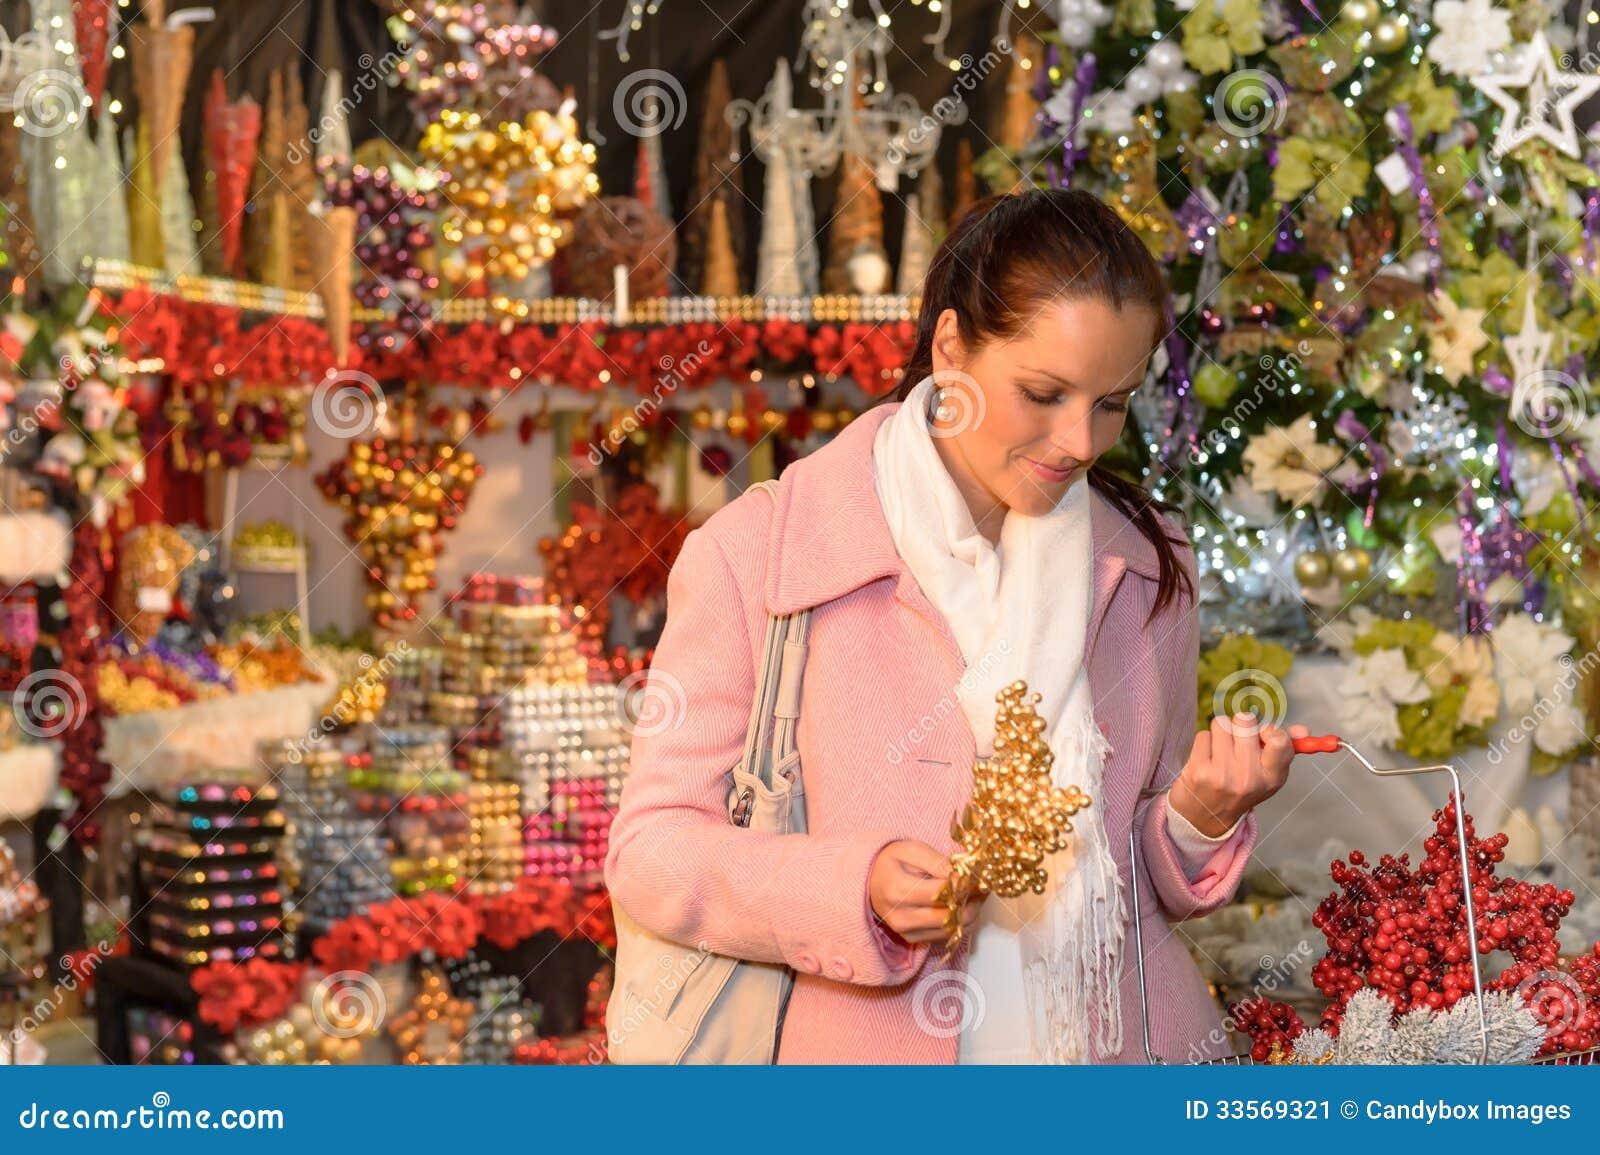 Woman Shopping Christmas Decorations Festive Mood Stock